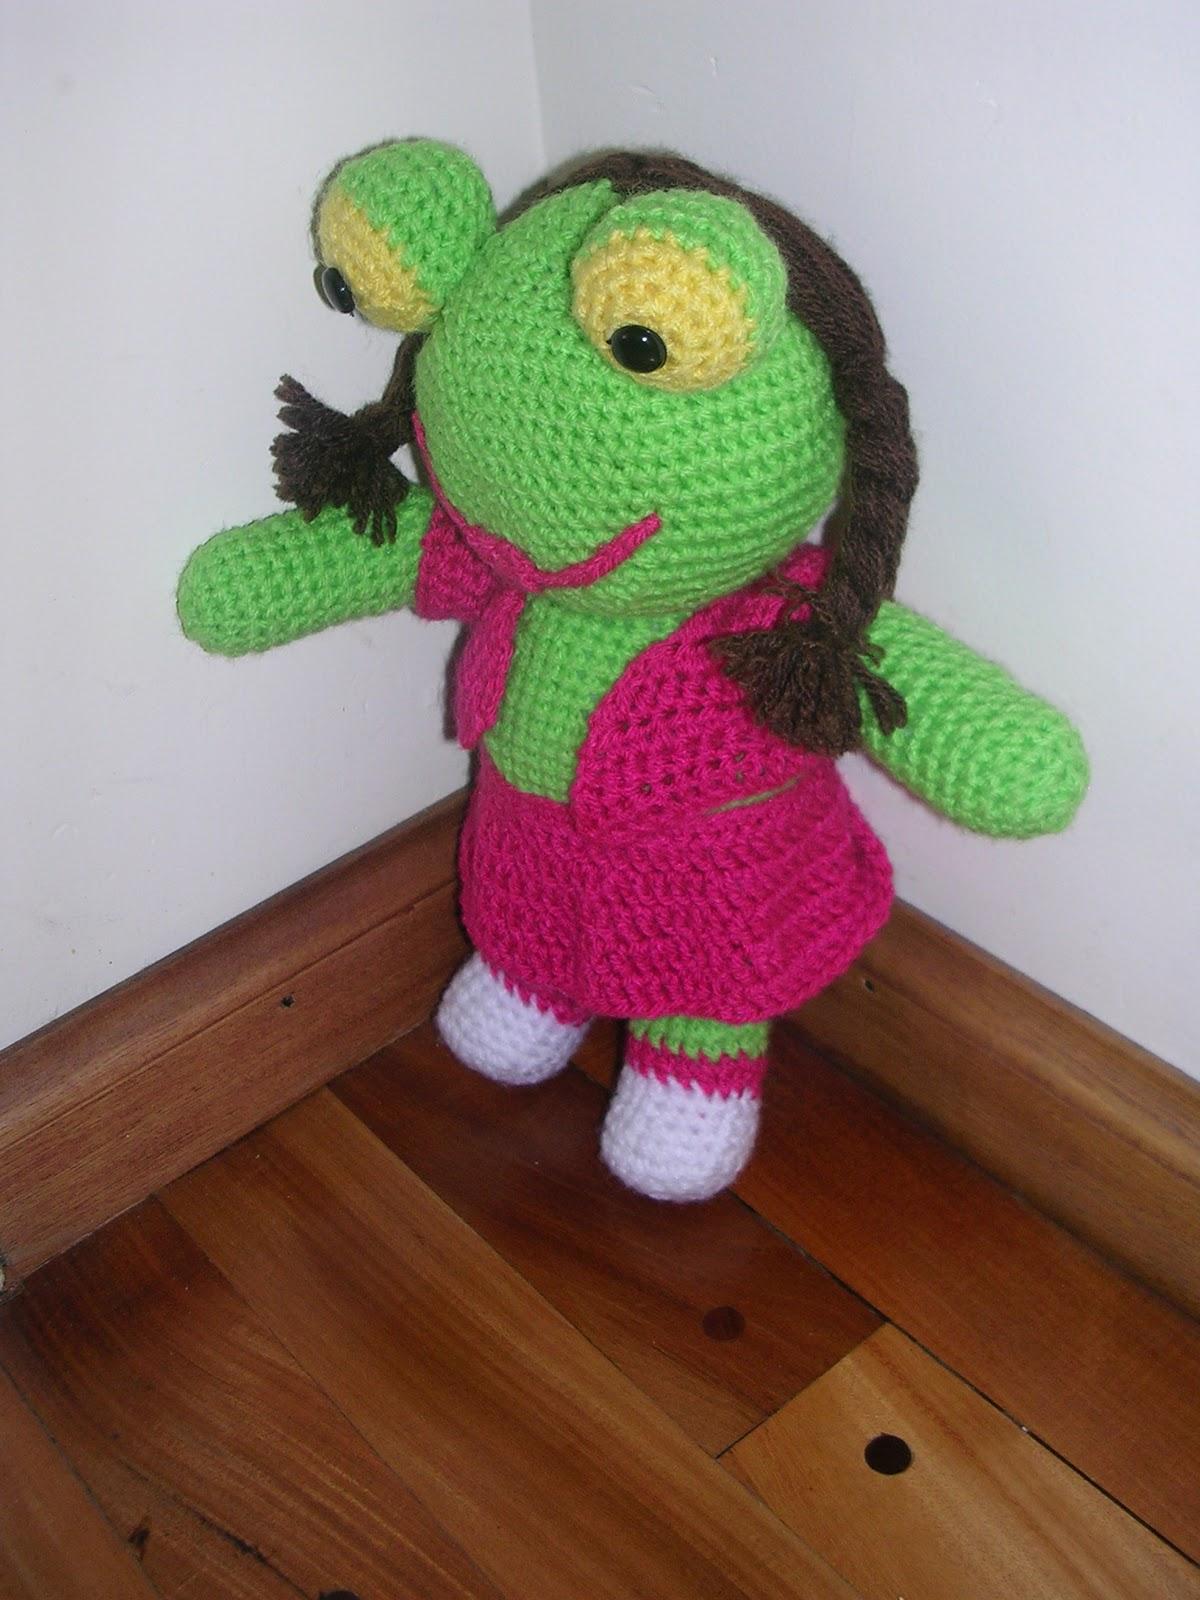 Patron Gorro Pepa A Crochet patr d7816d93451